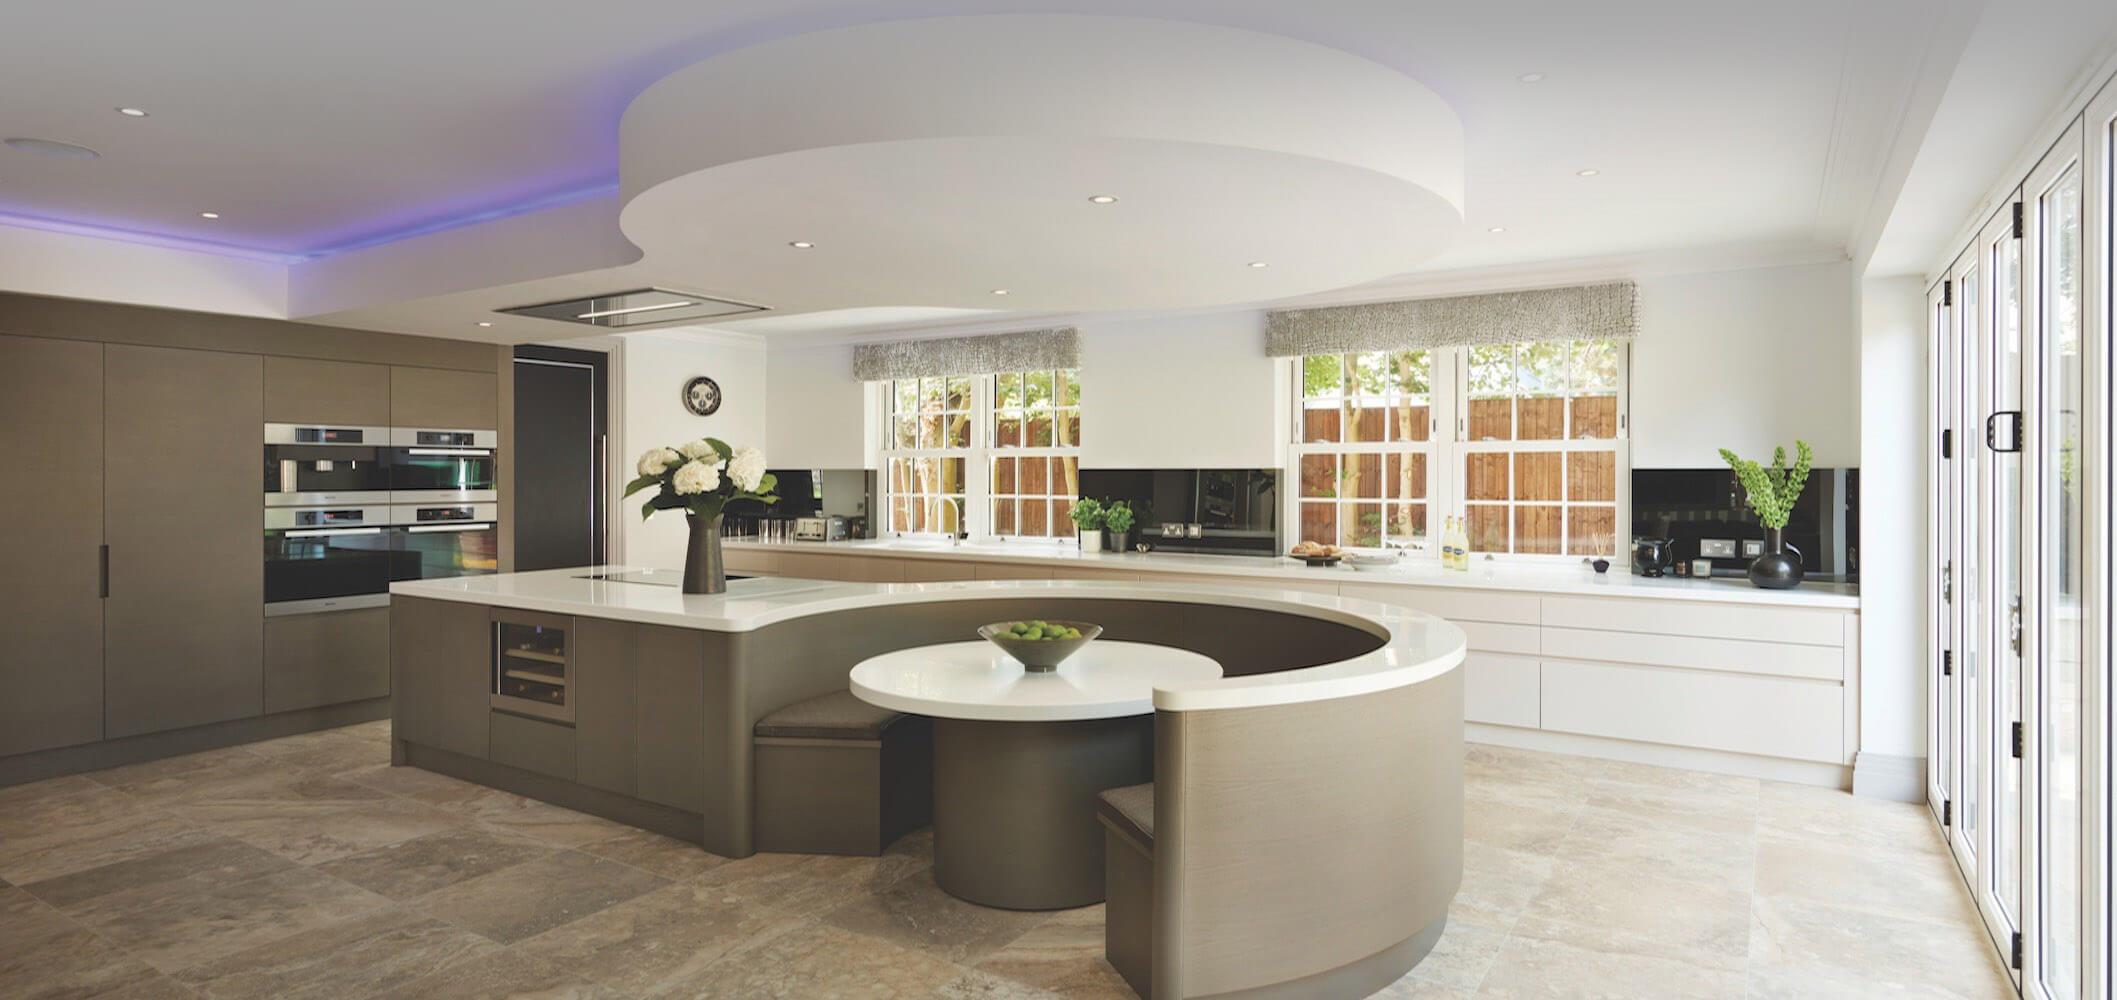 State-of-the-art modern kitchen design